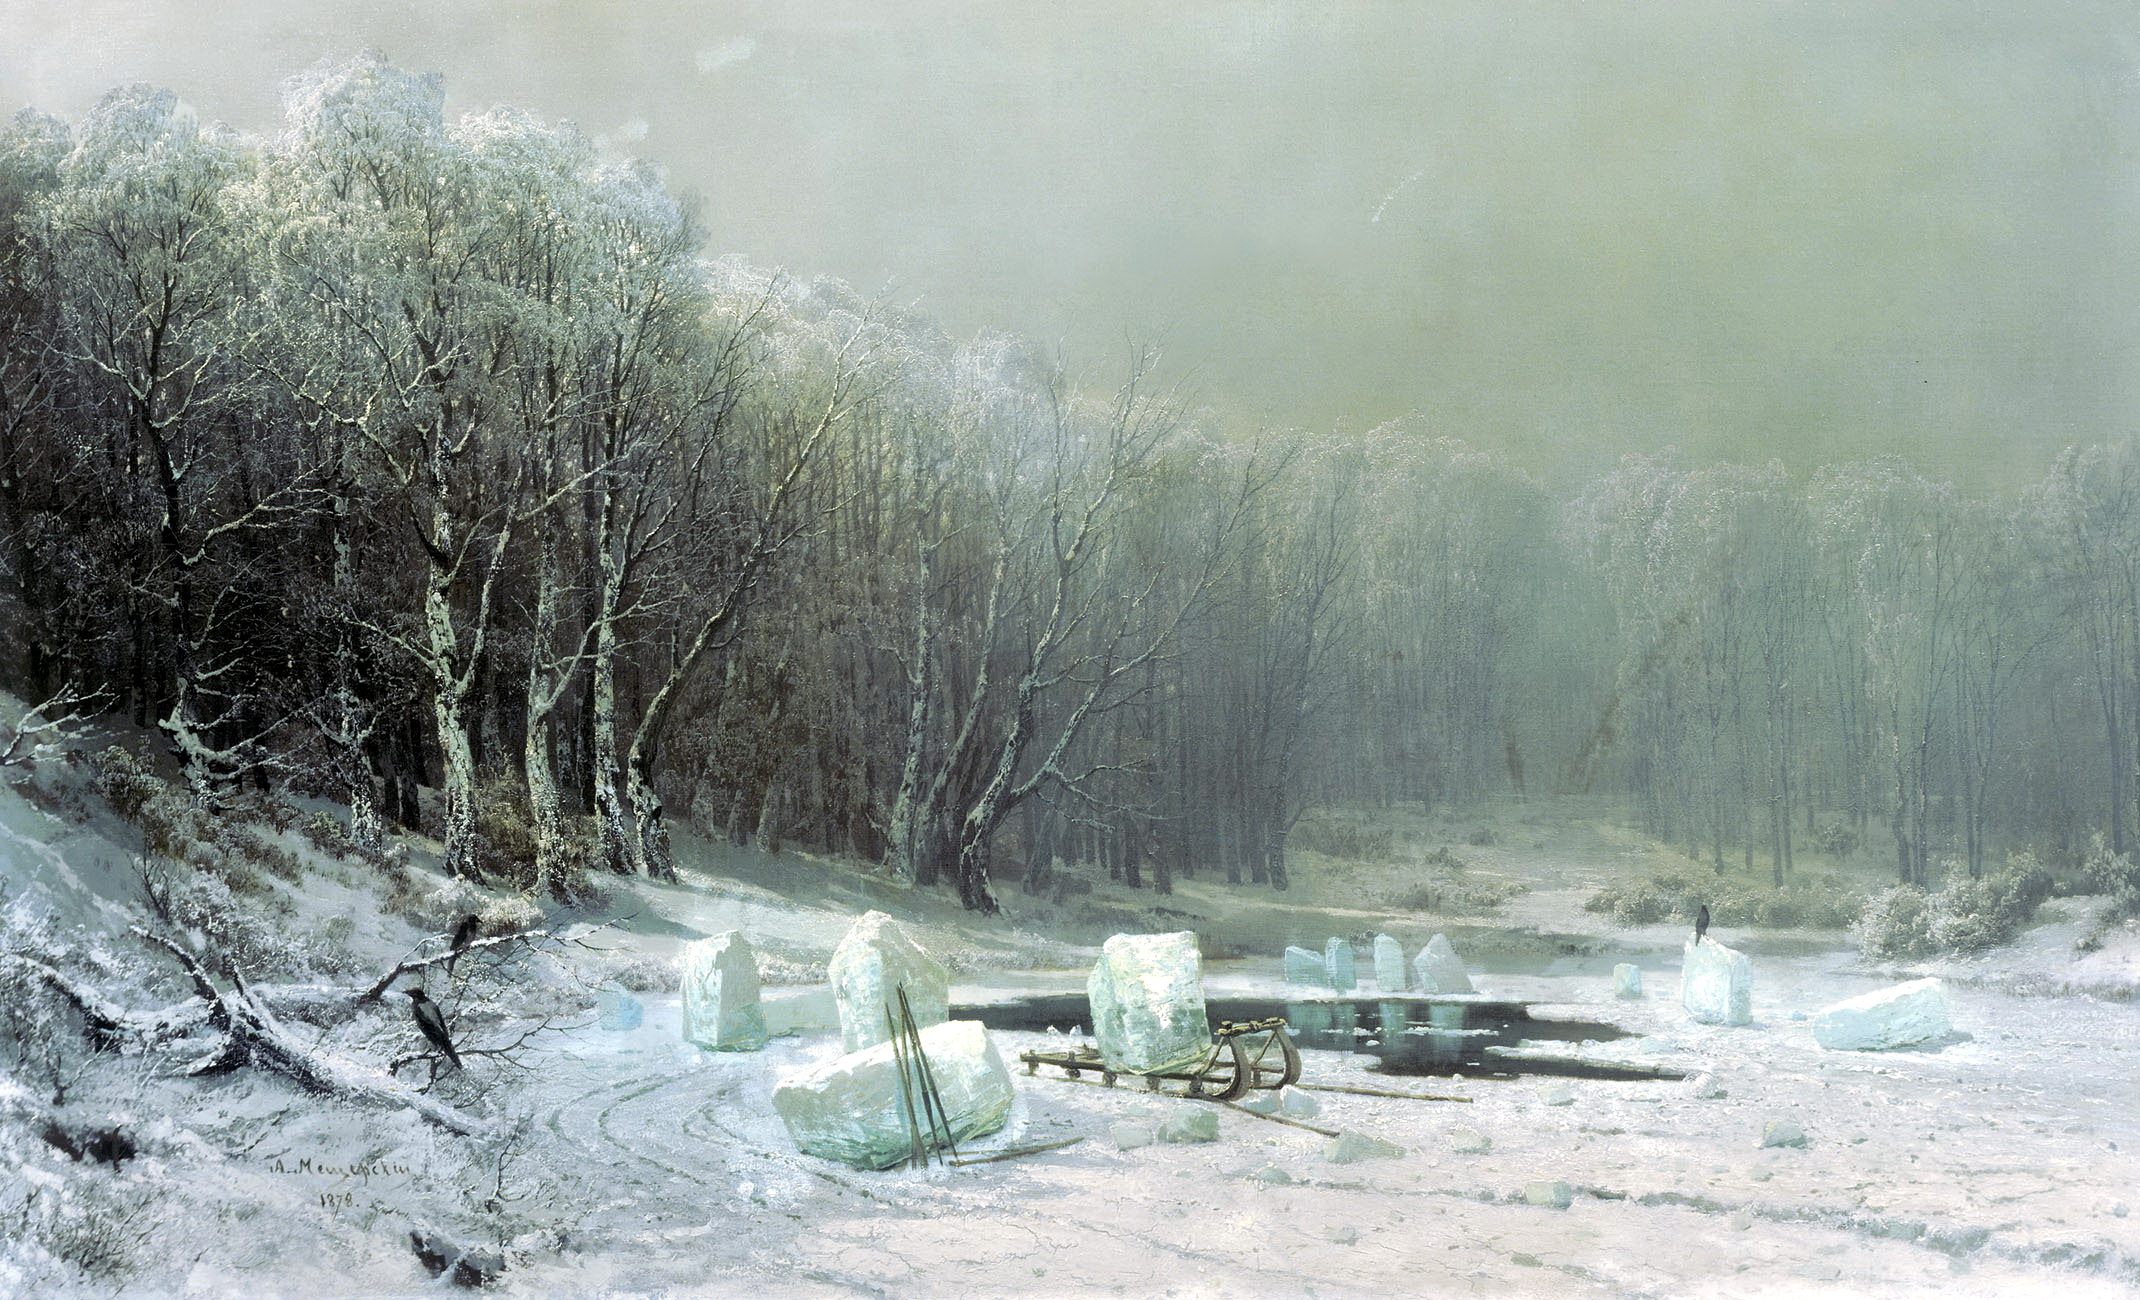 Арсений Мещерский картина Зима. Ледокол зимний пейзаж холст масло